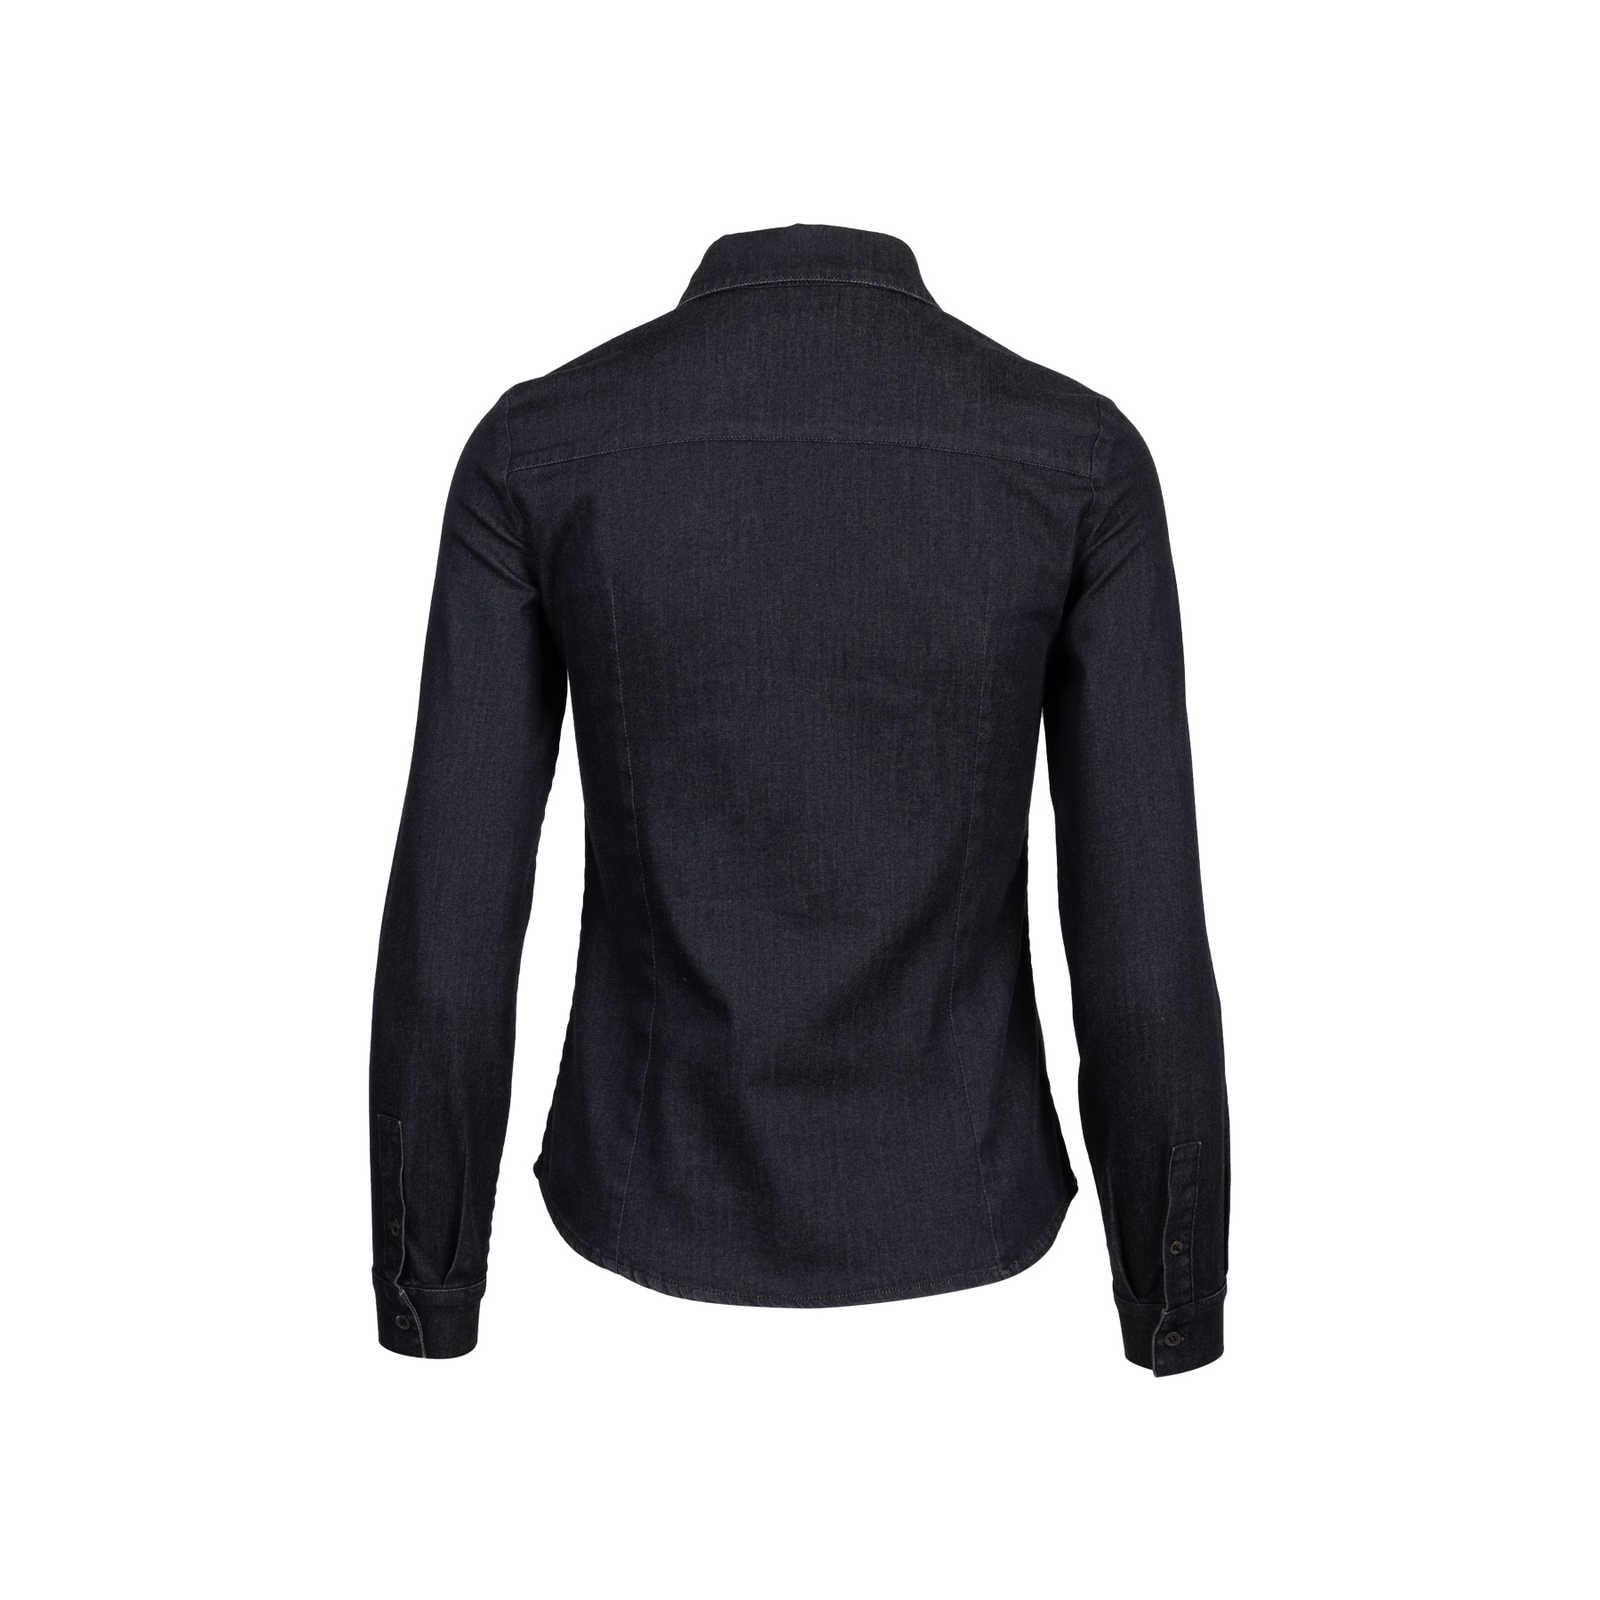 cda4b3fb689d5 ... Authentic Second Hand Miu Miu Denim Shirt (PSS-515-00126) - Thumbnail  ...